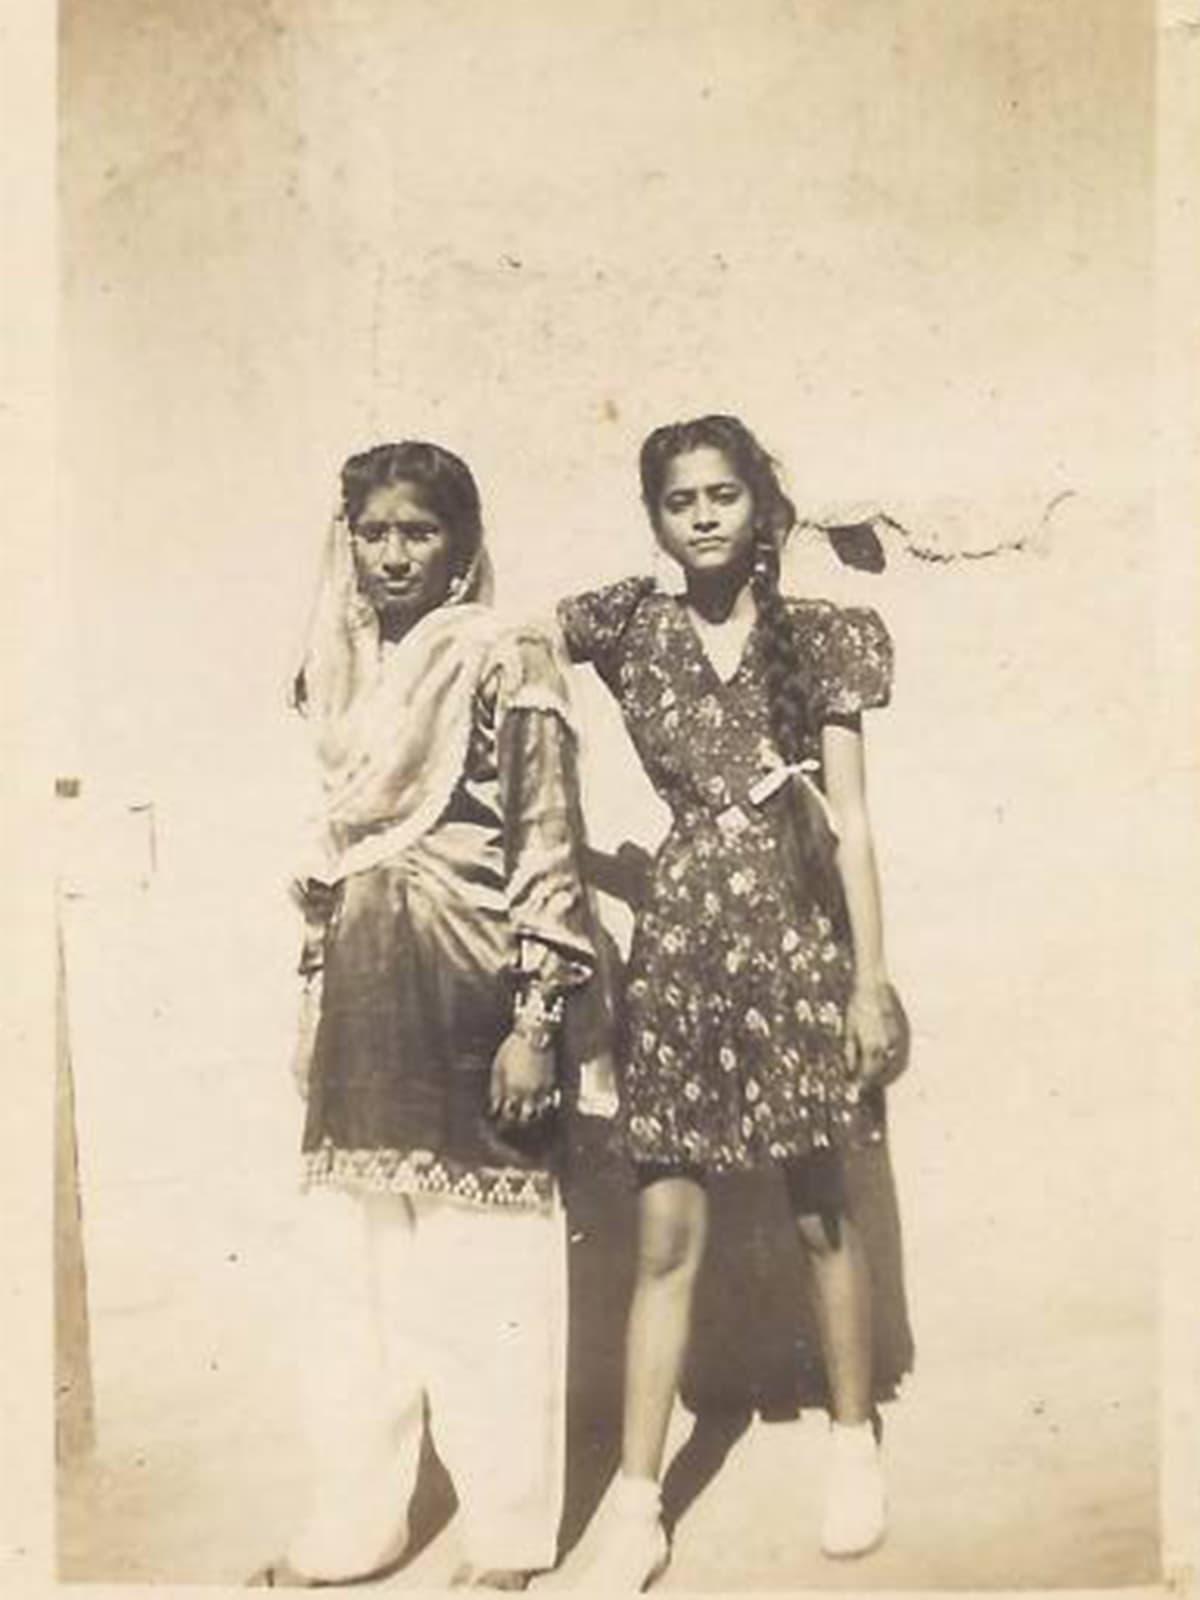 Savitri Badlani and Koshalya Bijlani in Larkana, Sindh, in 1946 | Photo by Nand Jaisinghani